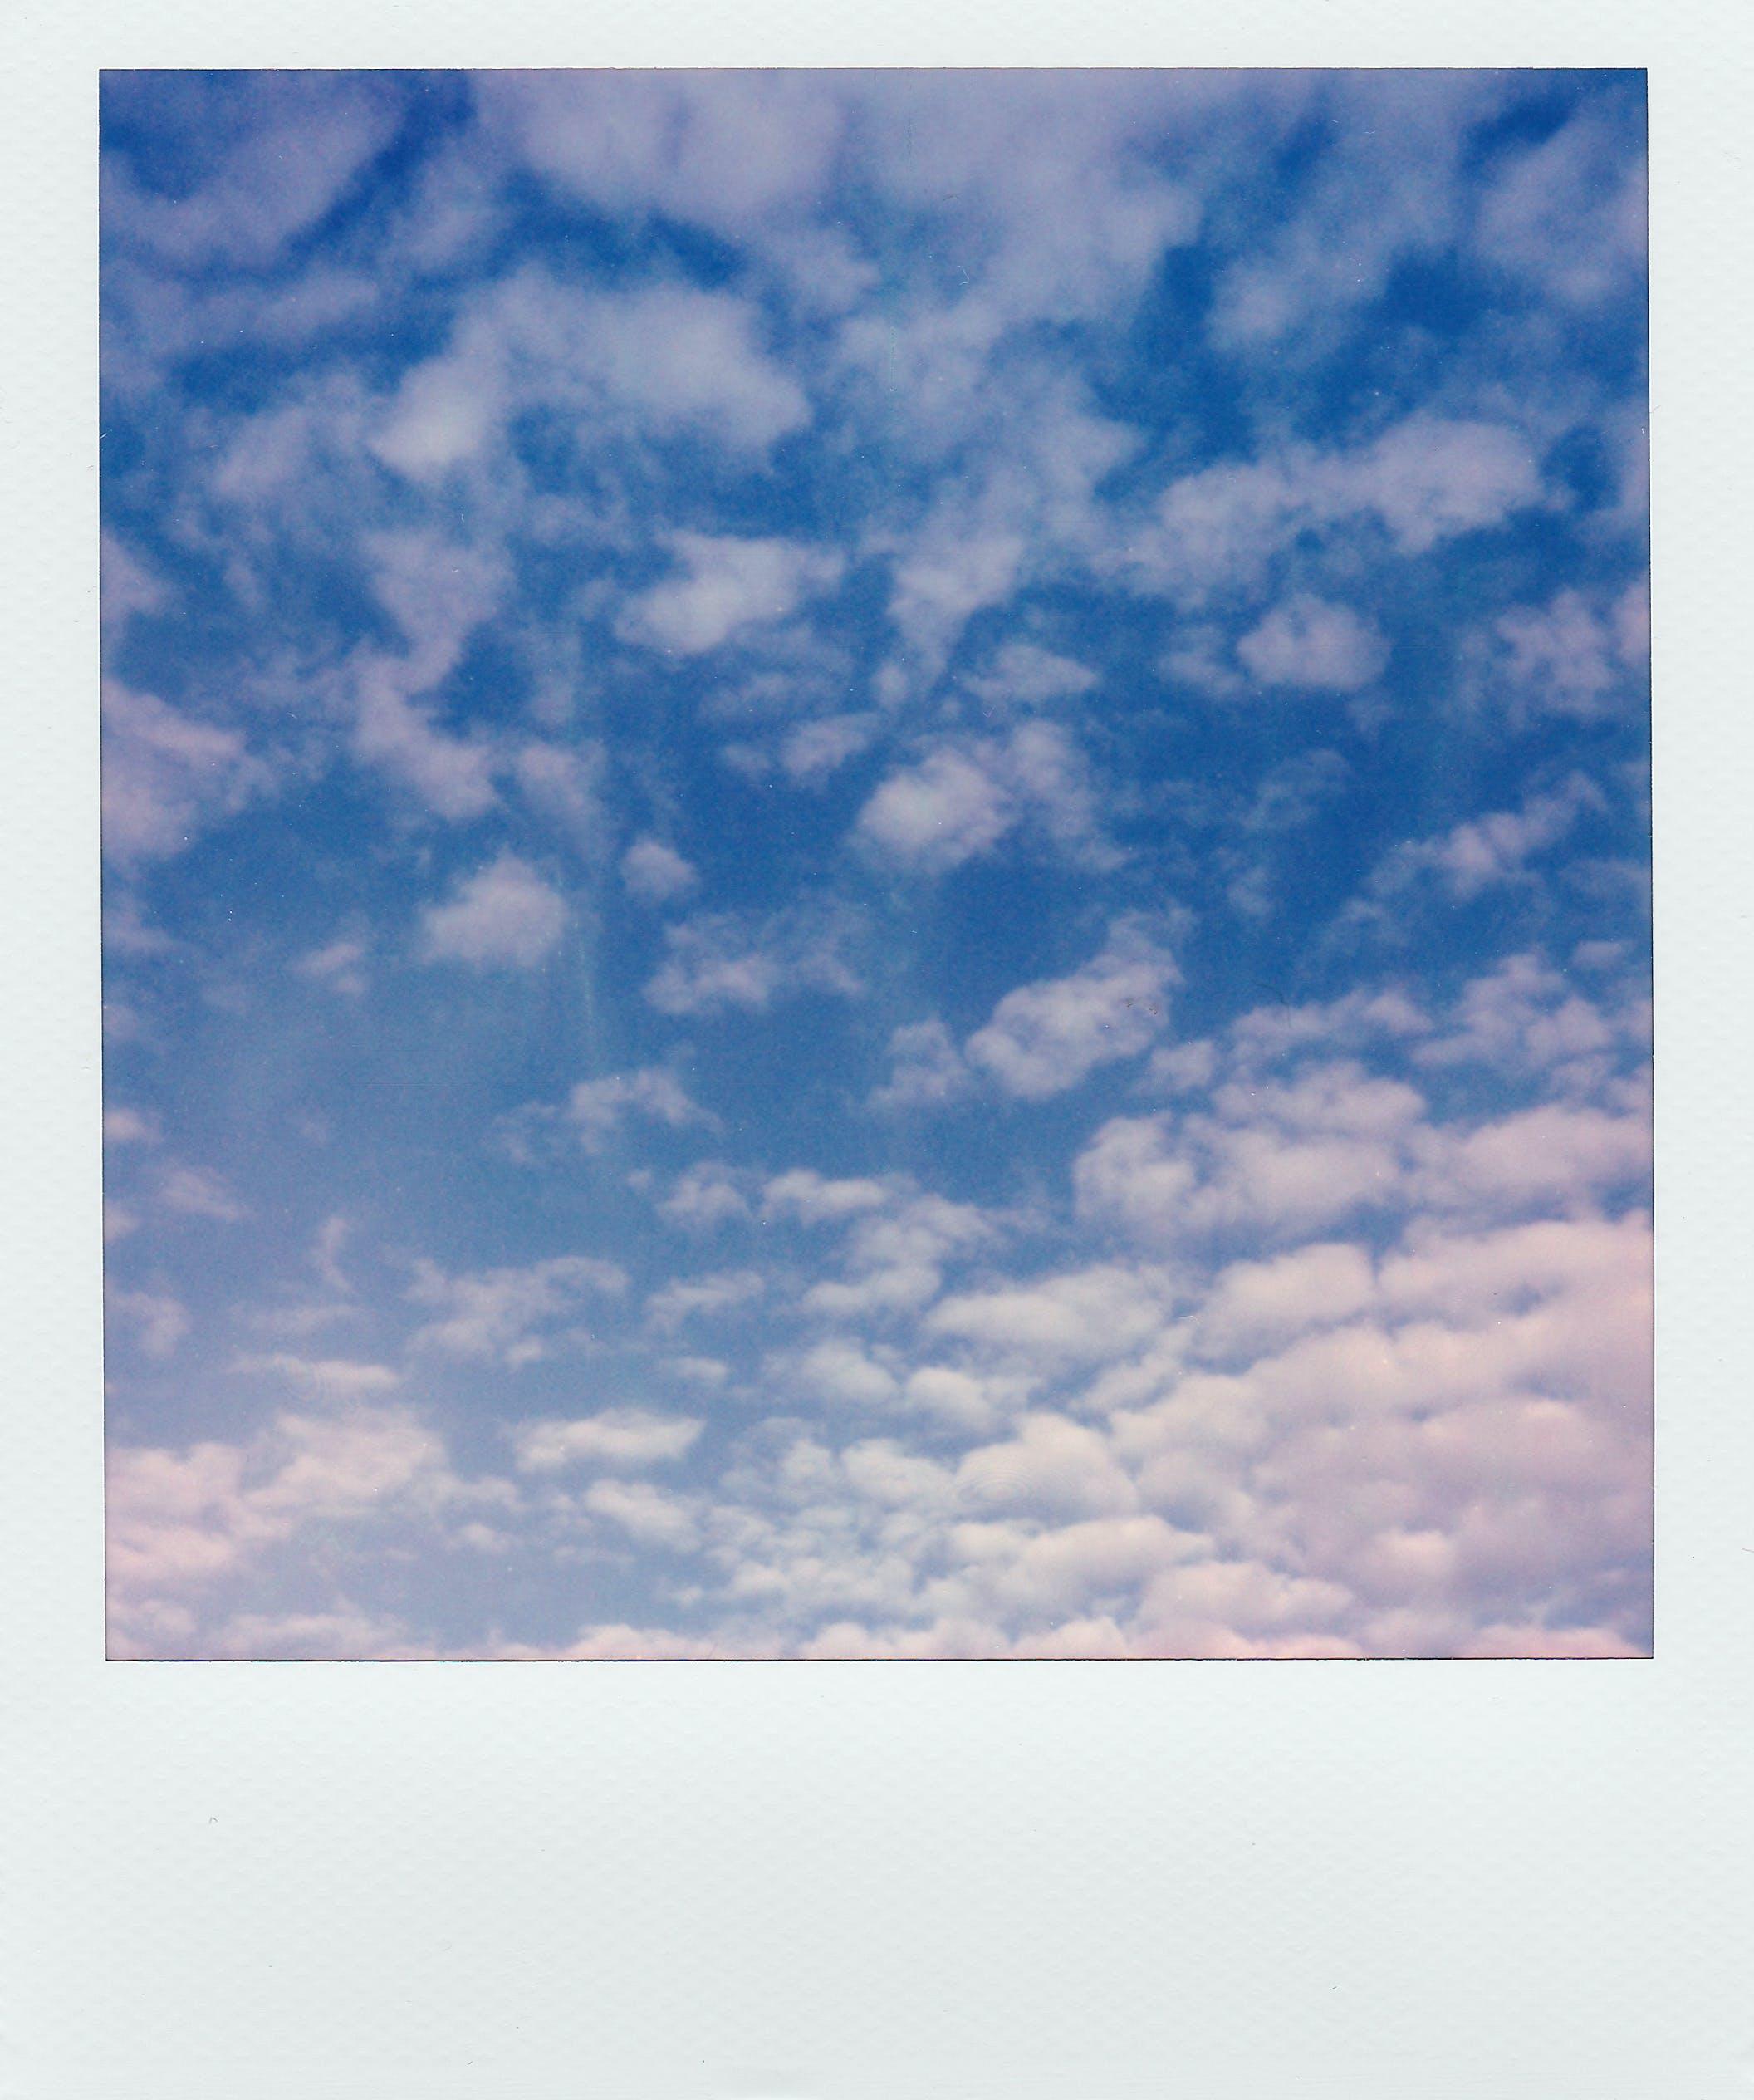 Gratis stockfoto met atmosfeer, bewolking, bewolkt, blauwe lucht